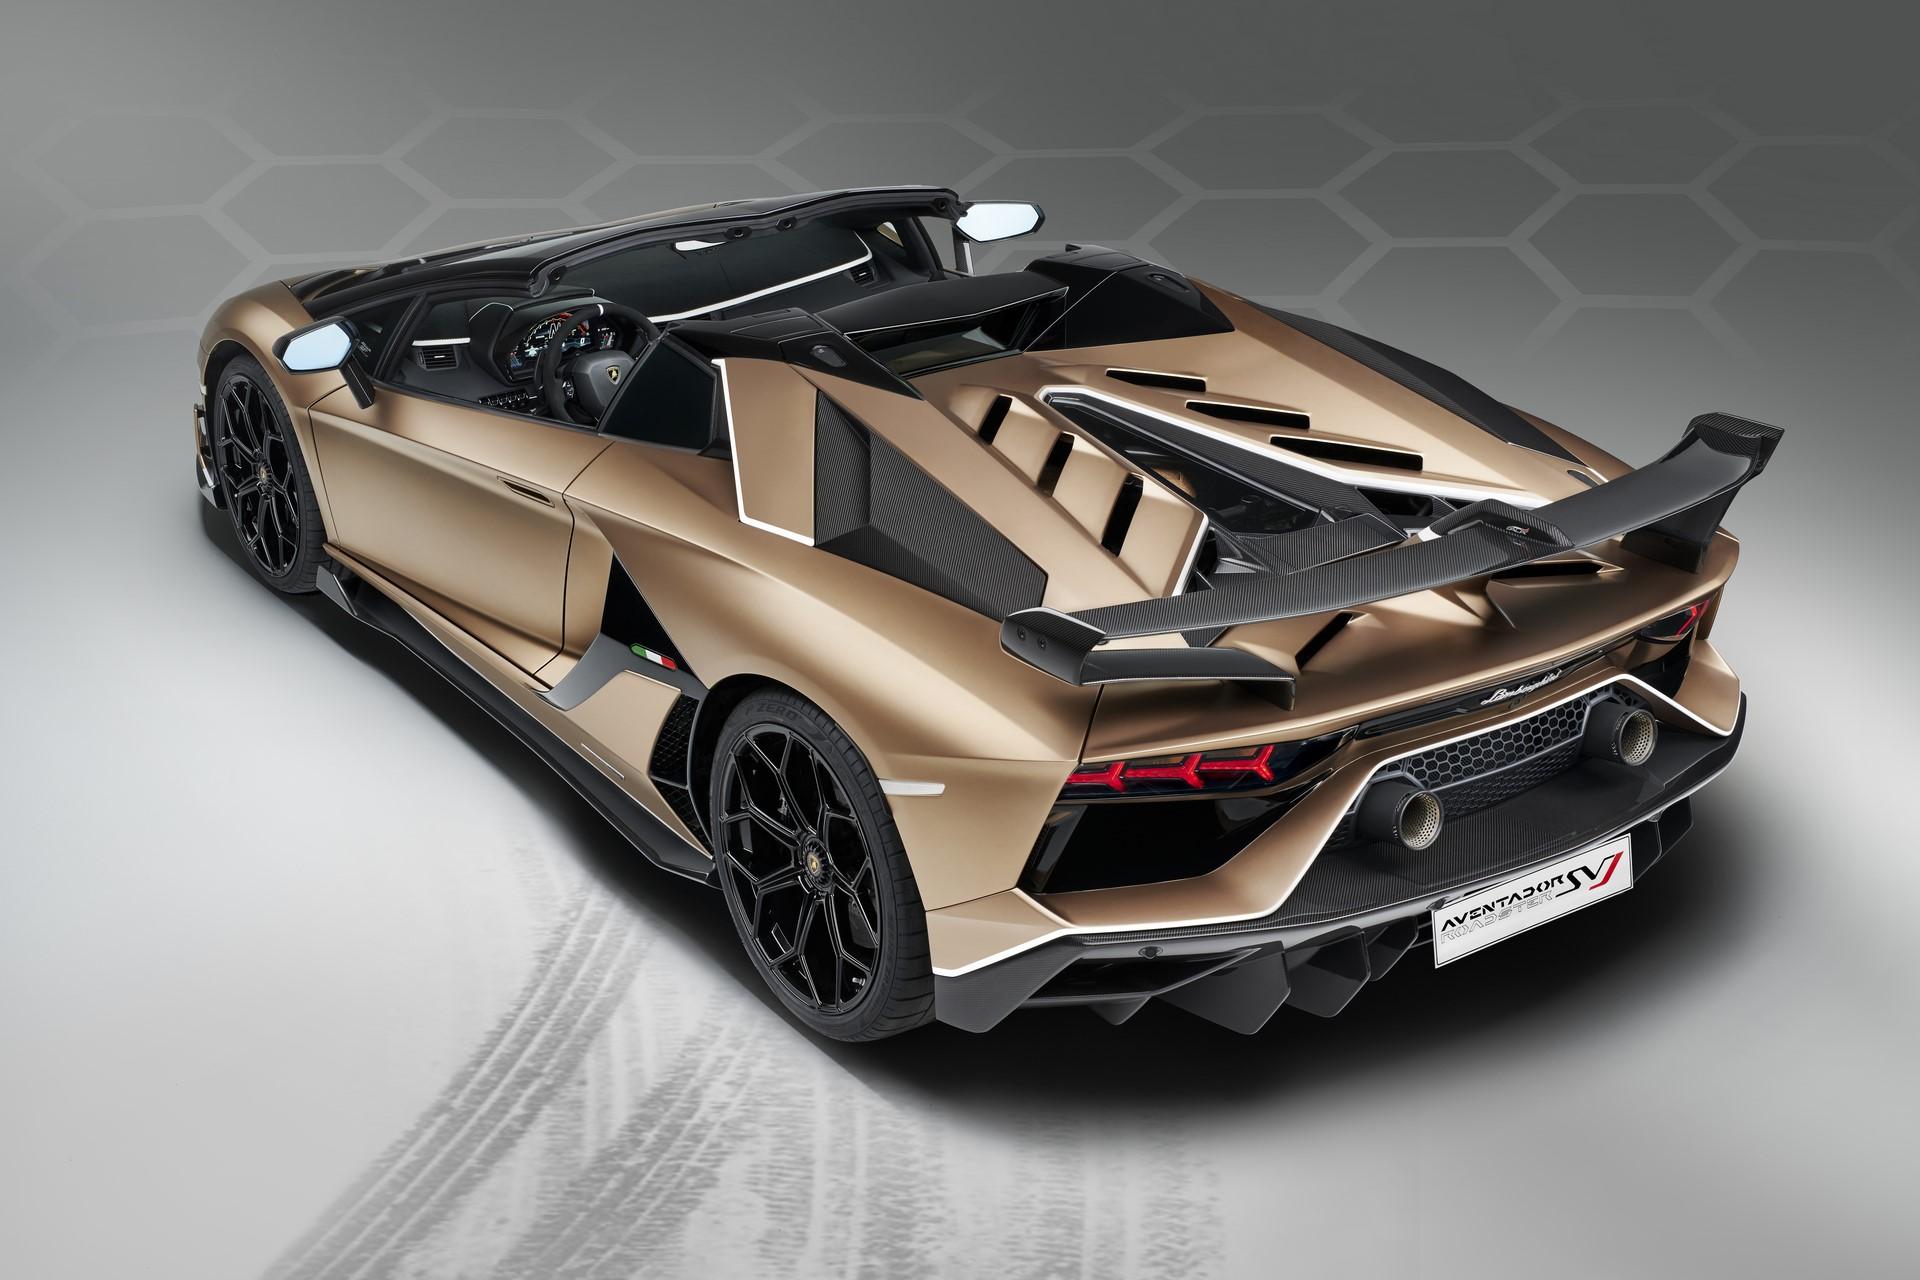 Lamborghini Aventador SVJ Roadster (23)